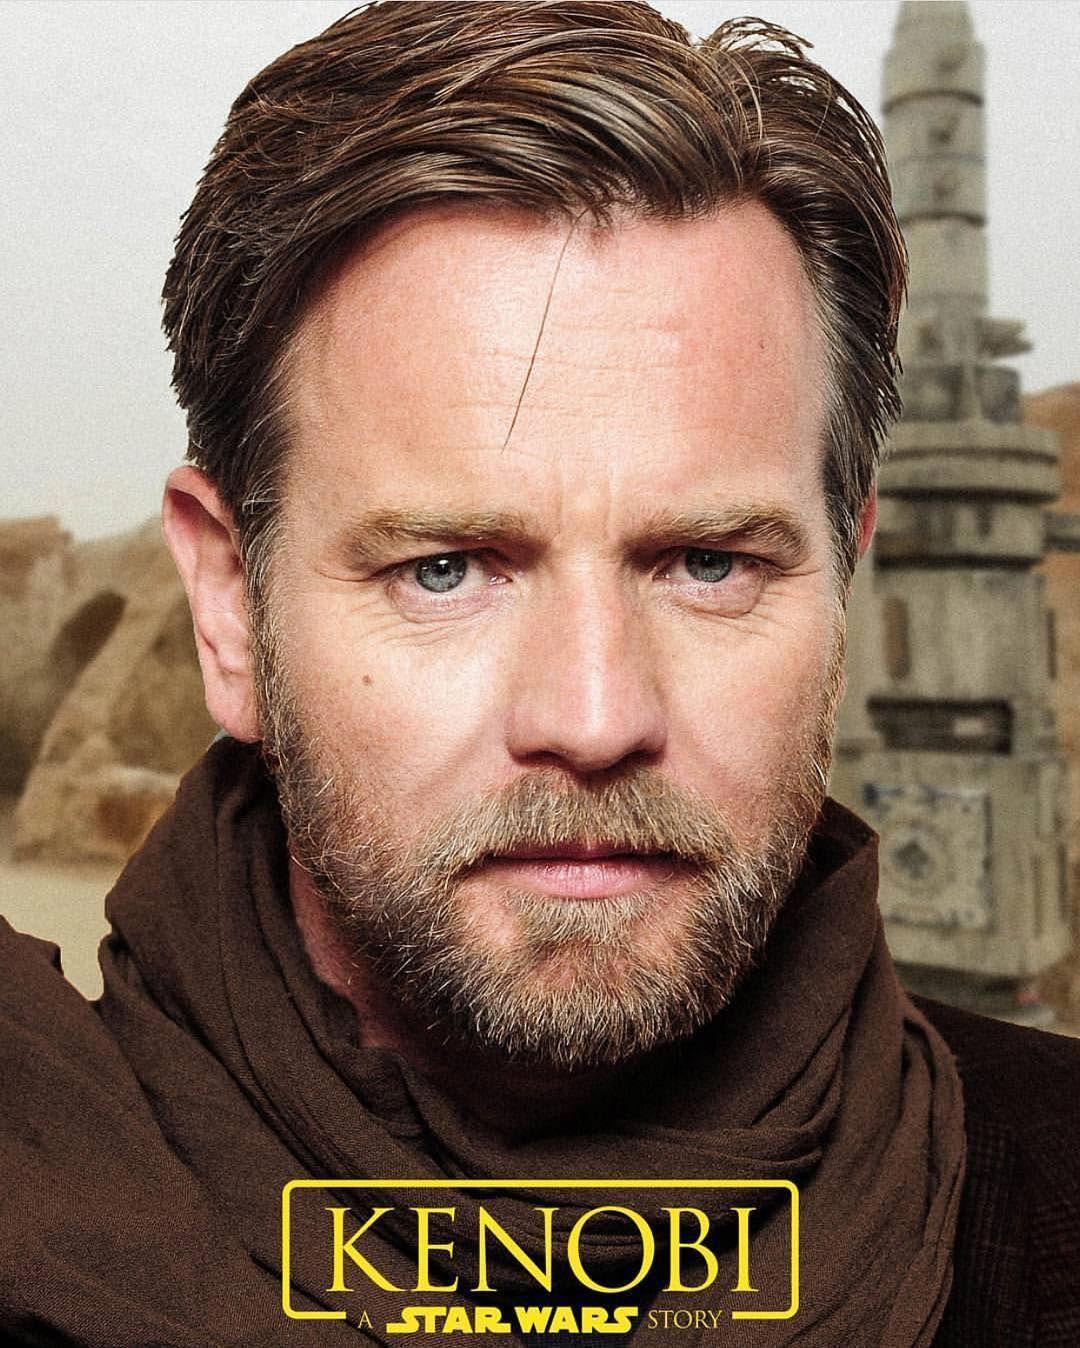 Obi Wan Kenobi Starwars Starwarsart Starwarsfanart Obiwankenobi Kenobi Star Wars Canon Star Wars Fandom Star Wars Obi Wan